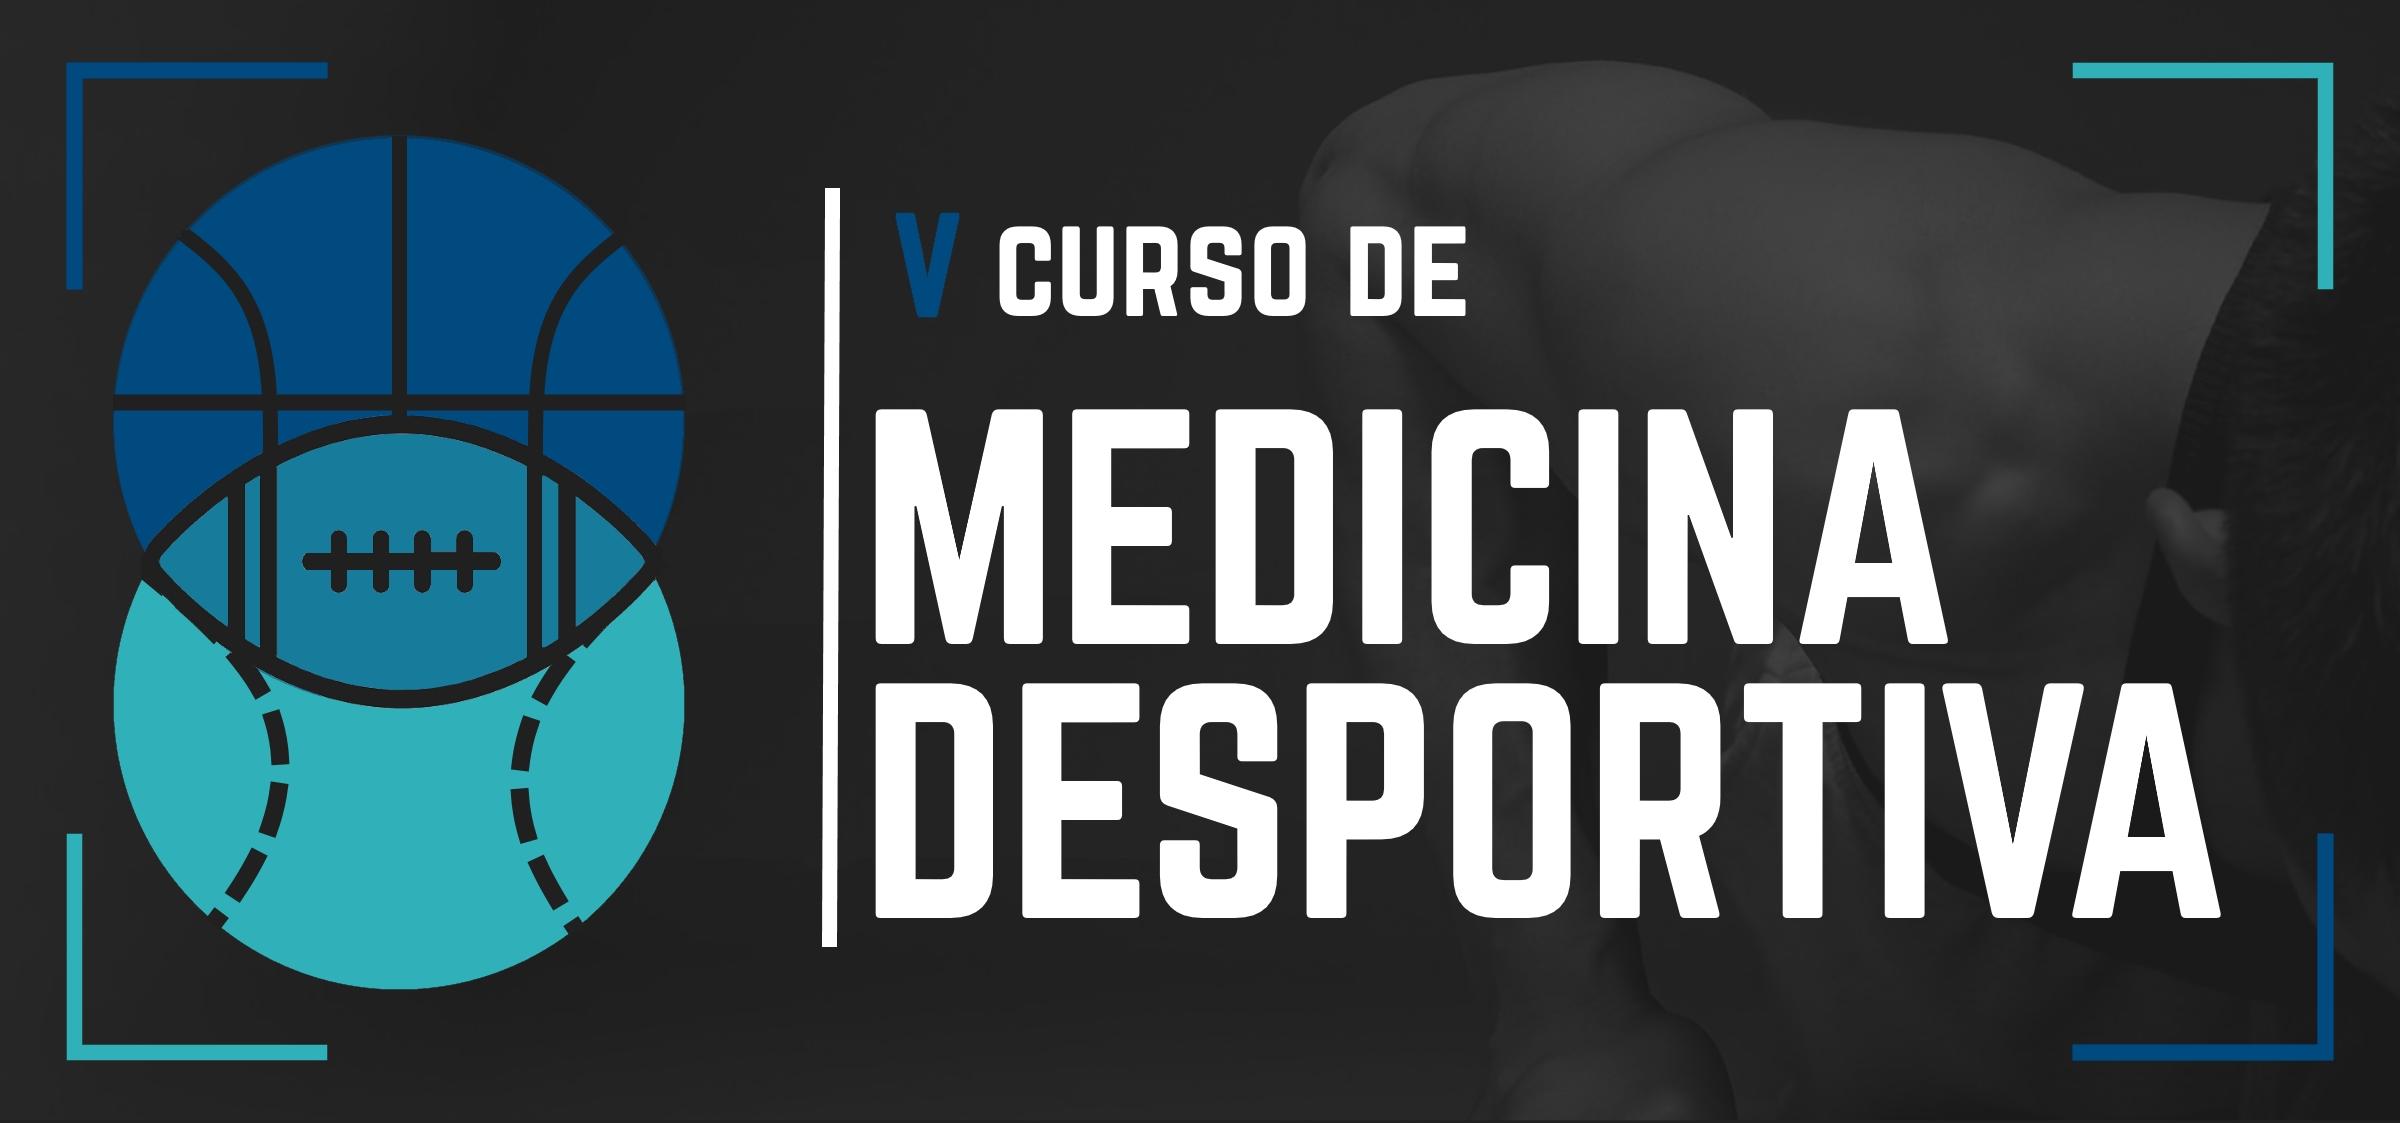 Curso de Medicina Desportiva